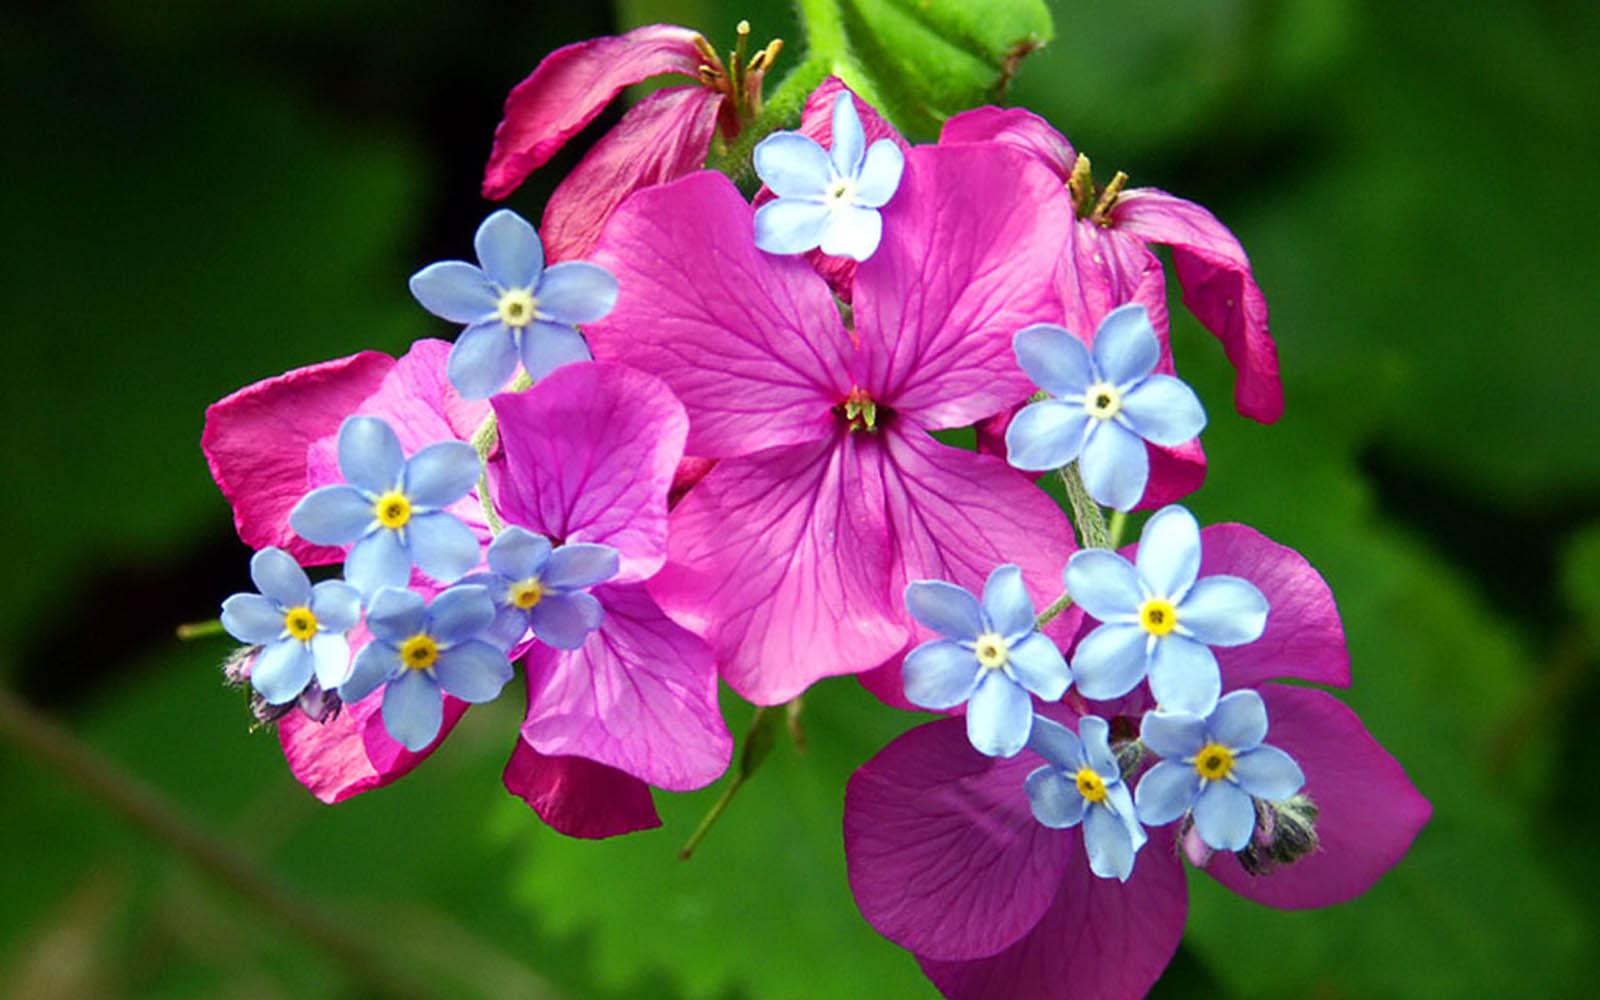 Beautiful Colorful 3d Hd Flowers Wallpaper For Desktop ...